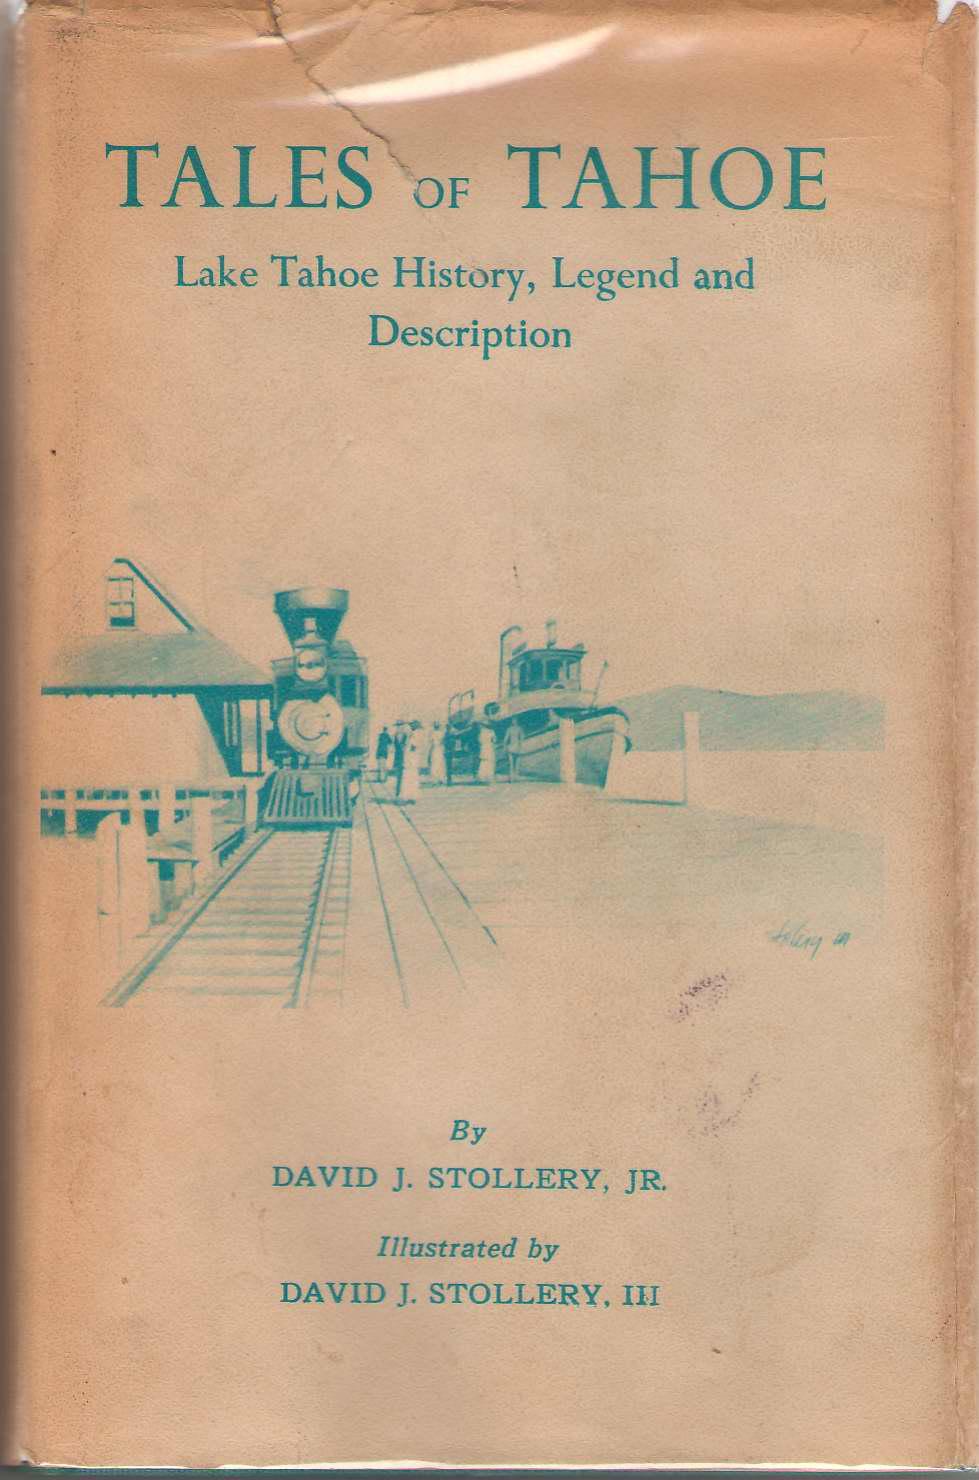 Tales of Tahoe, David J. Stollery, Jr. &  III David J. Stollery